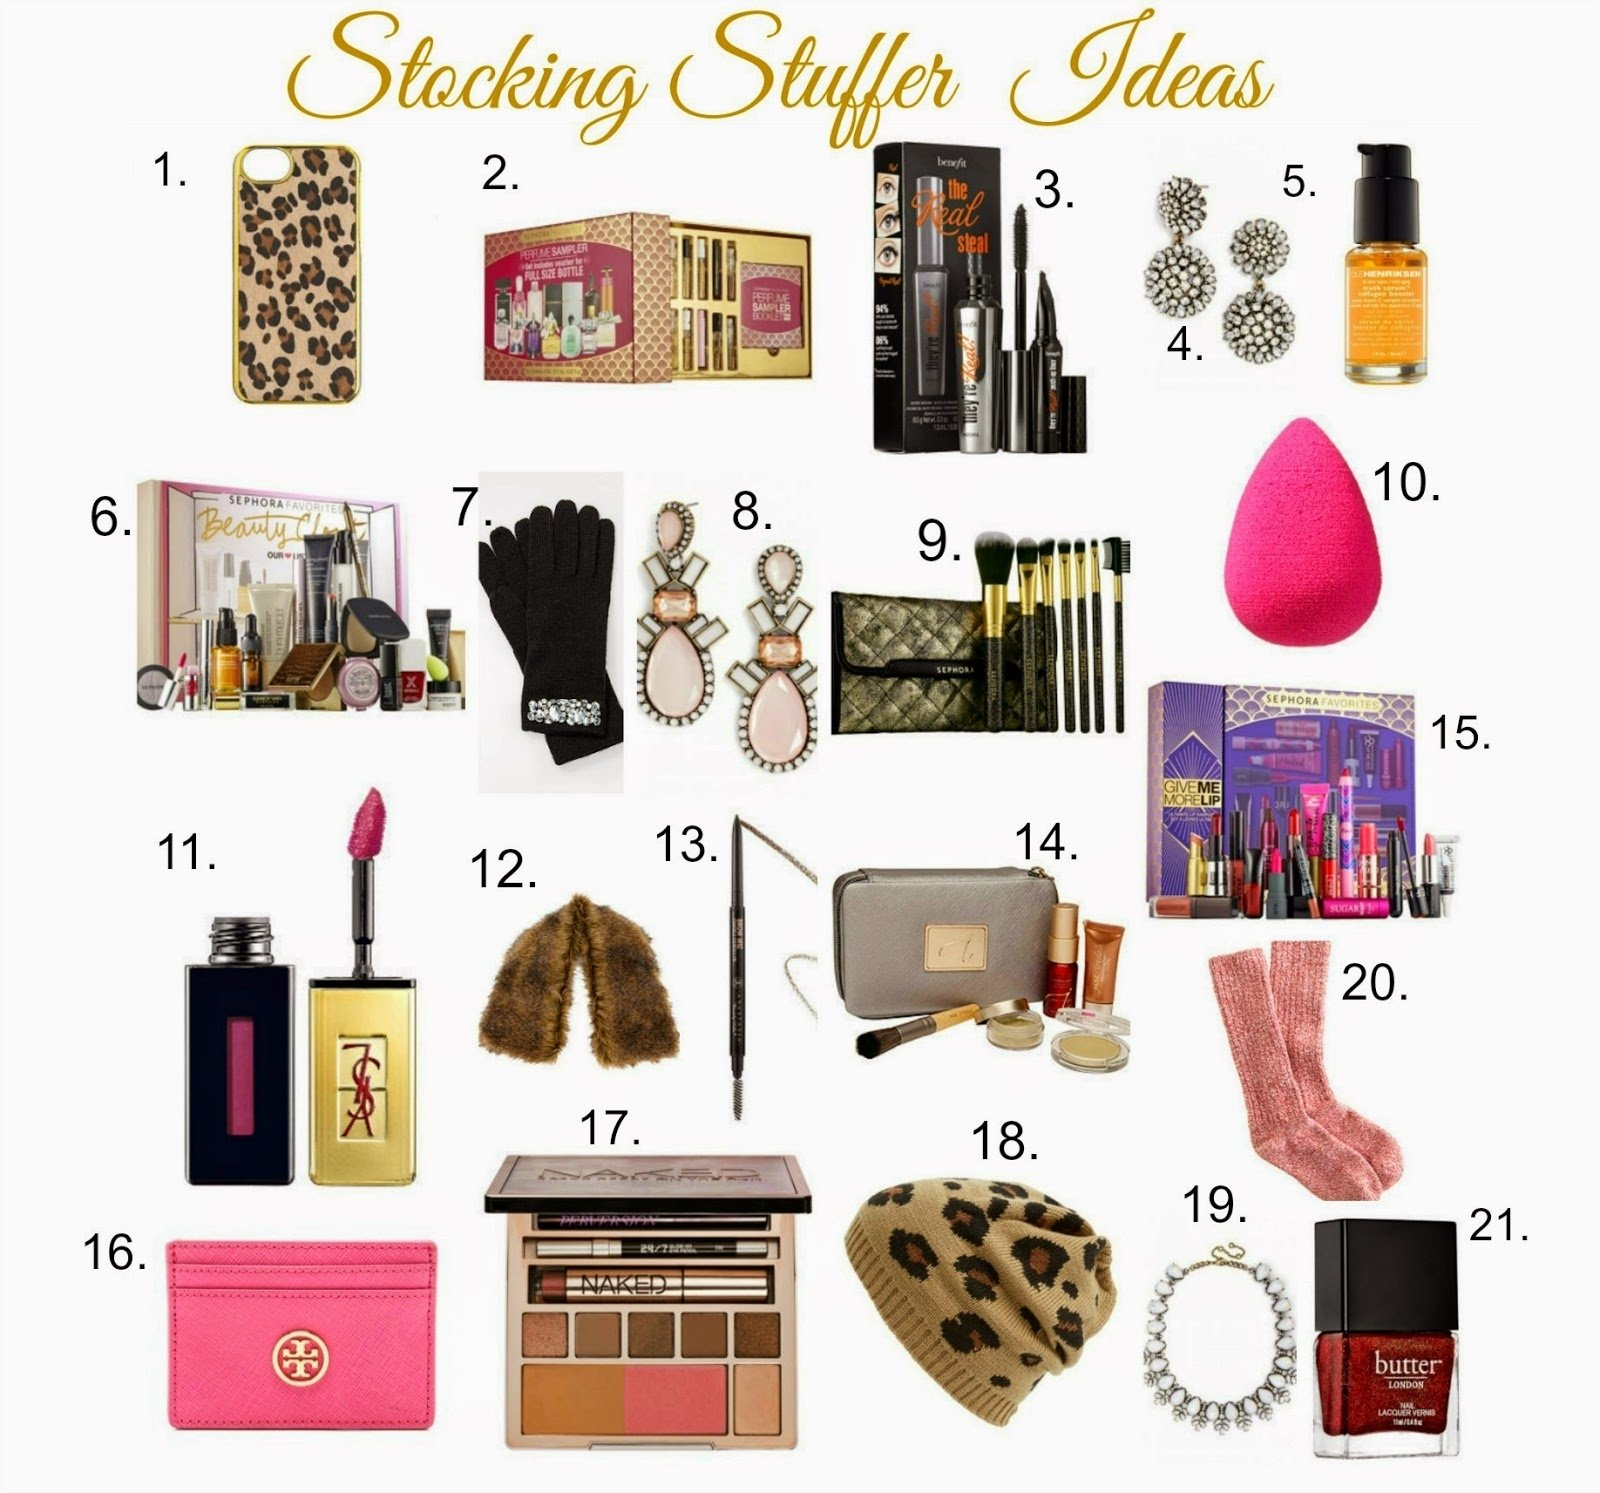 10 Amazing Stocking Stuffer Ideas For Wife stocking stuffer ideas for her kiss me darling 2